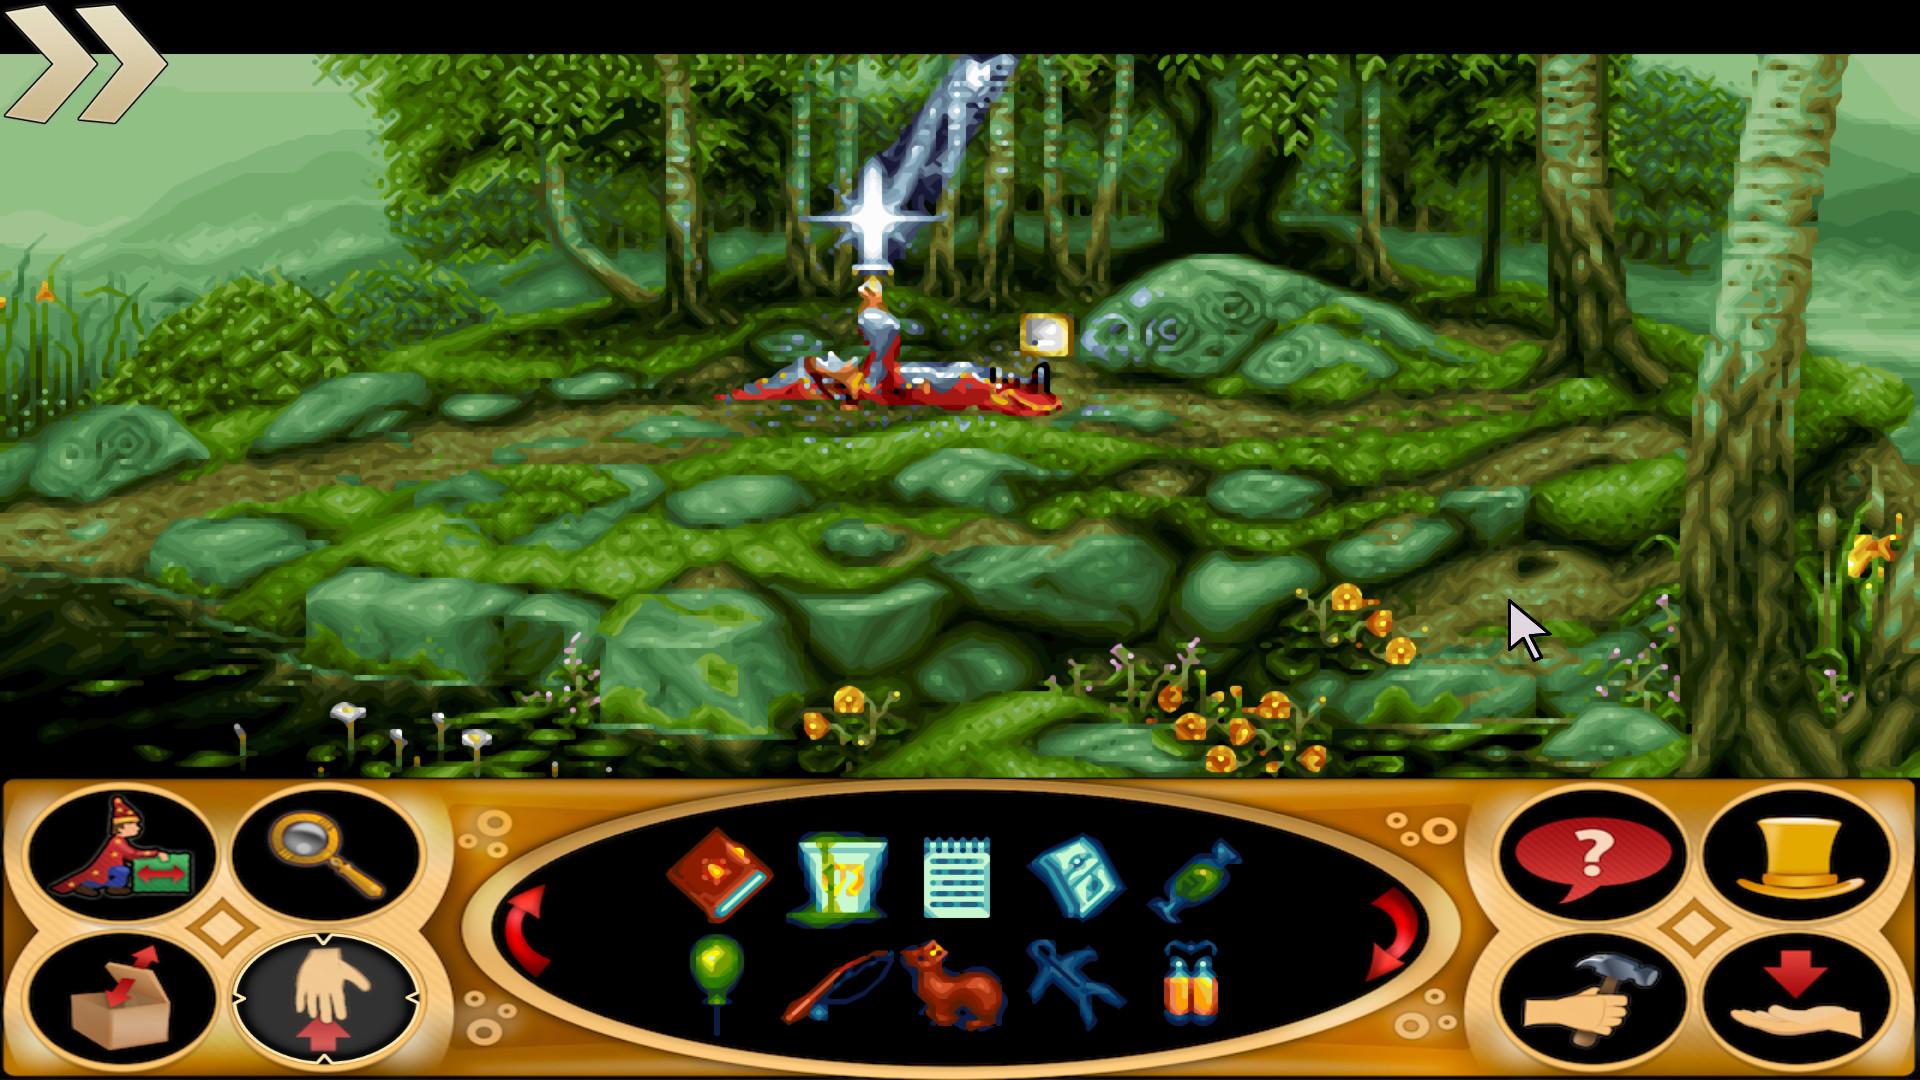 Simon the Sorcerer 2: 25th Anniversary Edition Screenshot 2